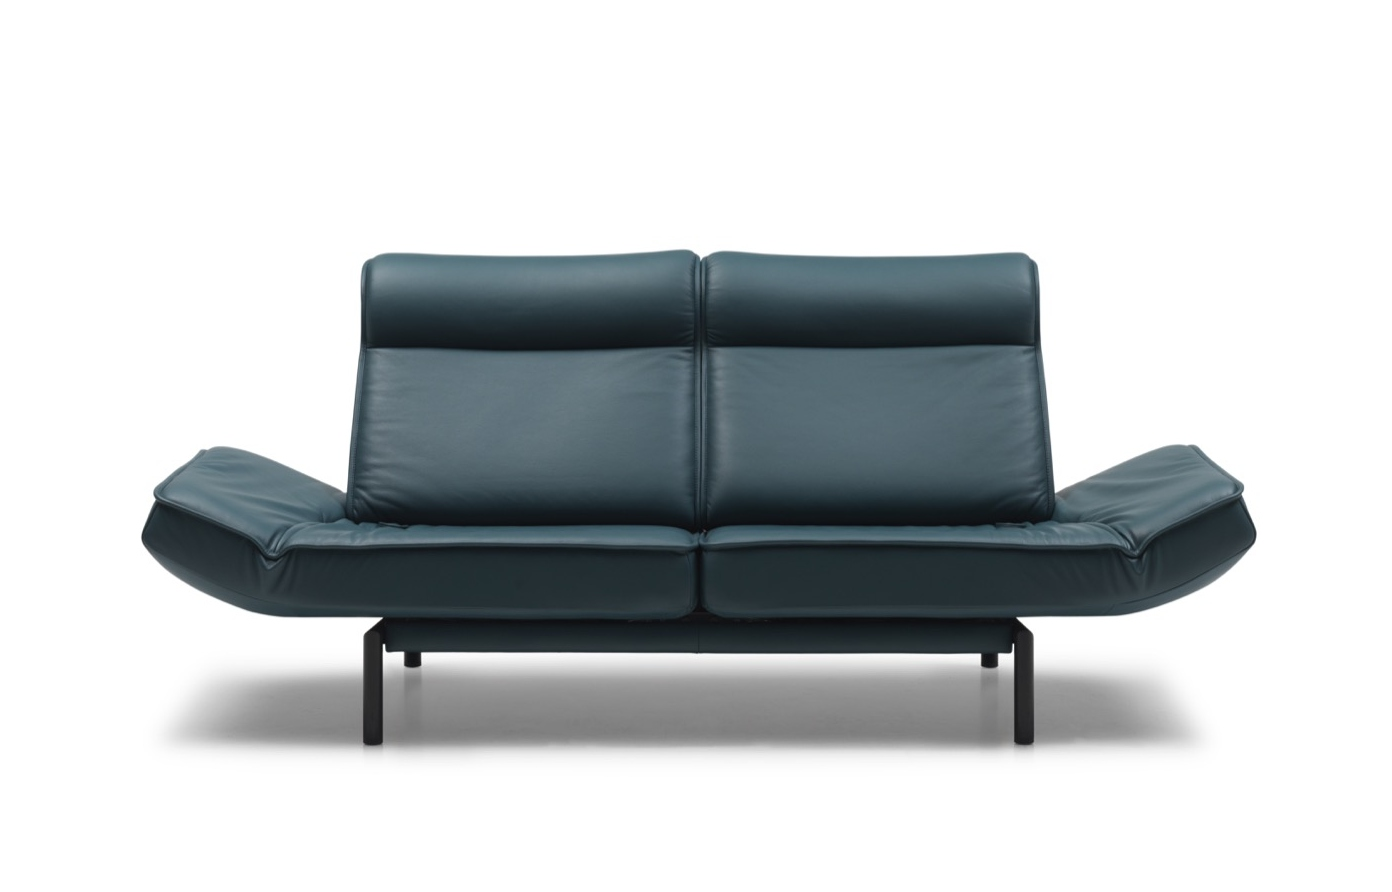 de sede ds 450 02 draaibank matser wageningen. Black Bedroom Furniture Sets. Home Design Ideas